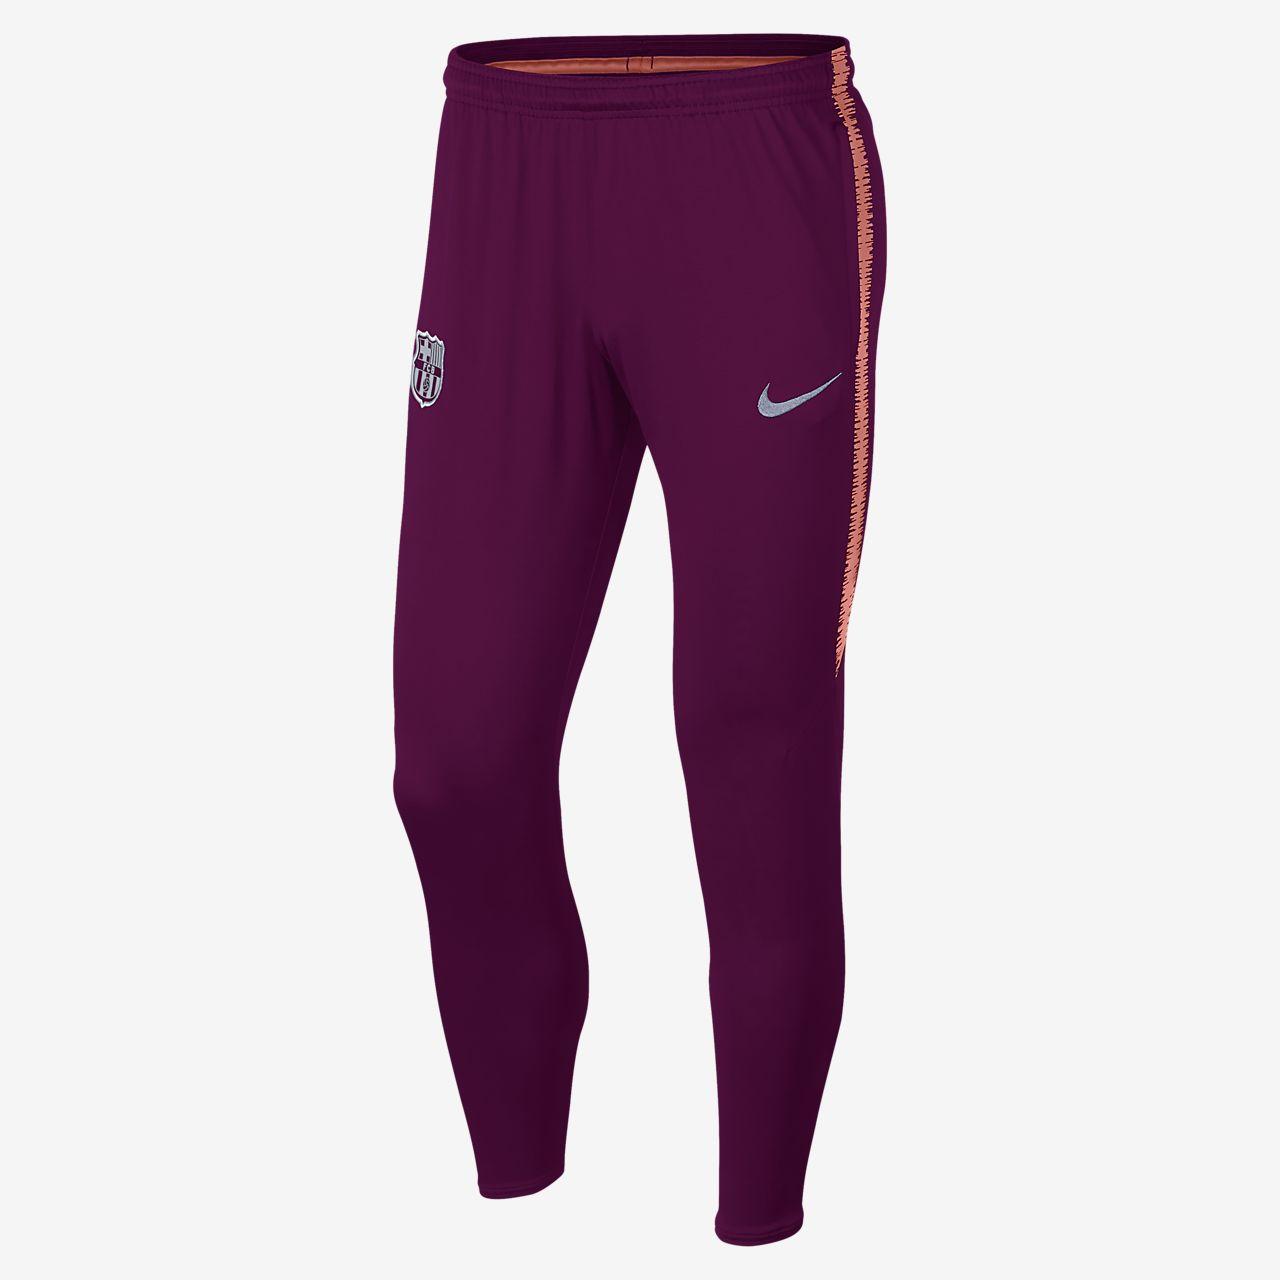 9f8804dac614 FC Barcelona Dri-FIT Squad Men s Football Pants. Nike.com GB